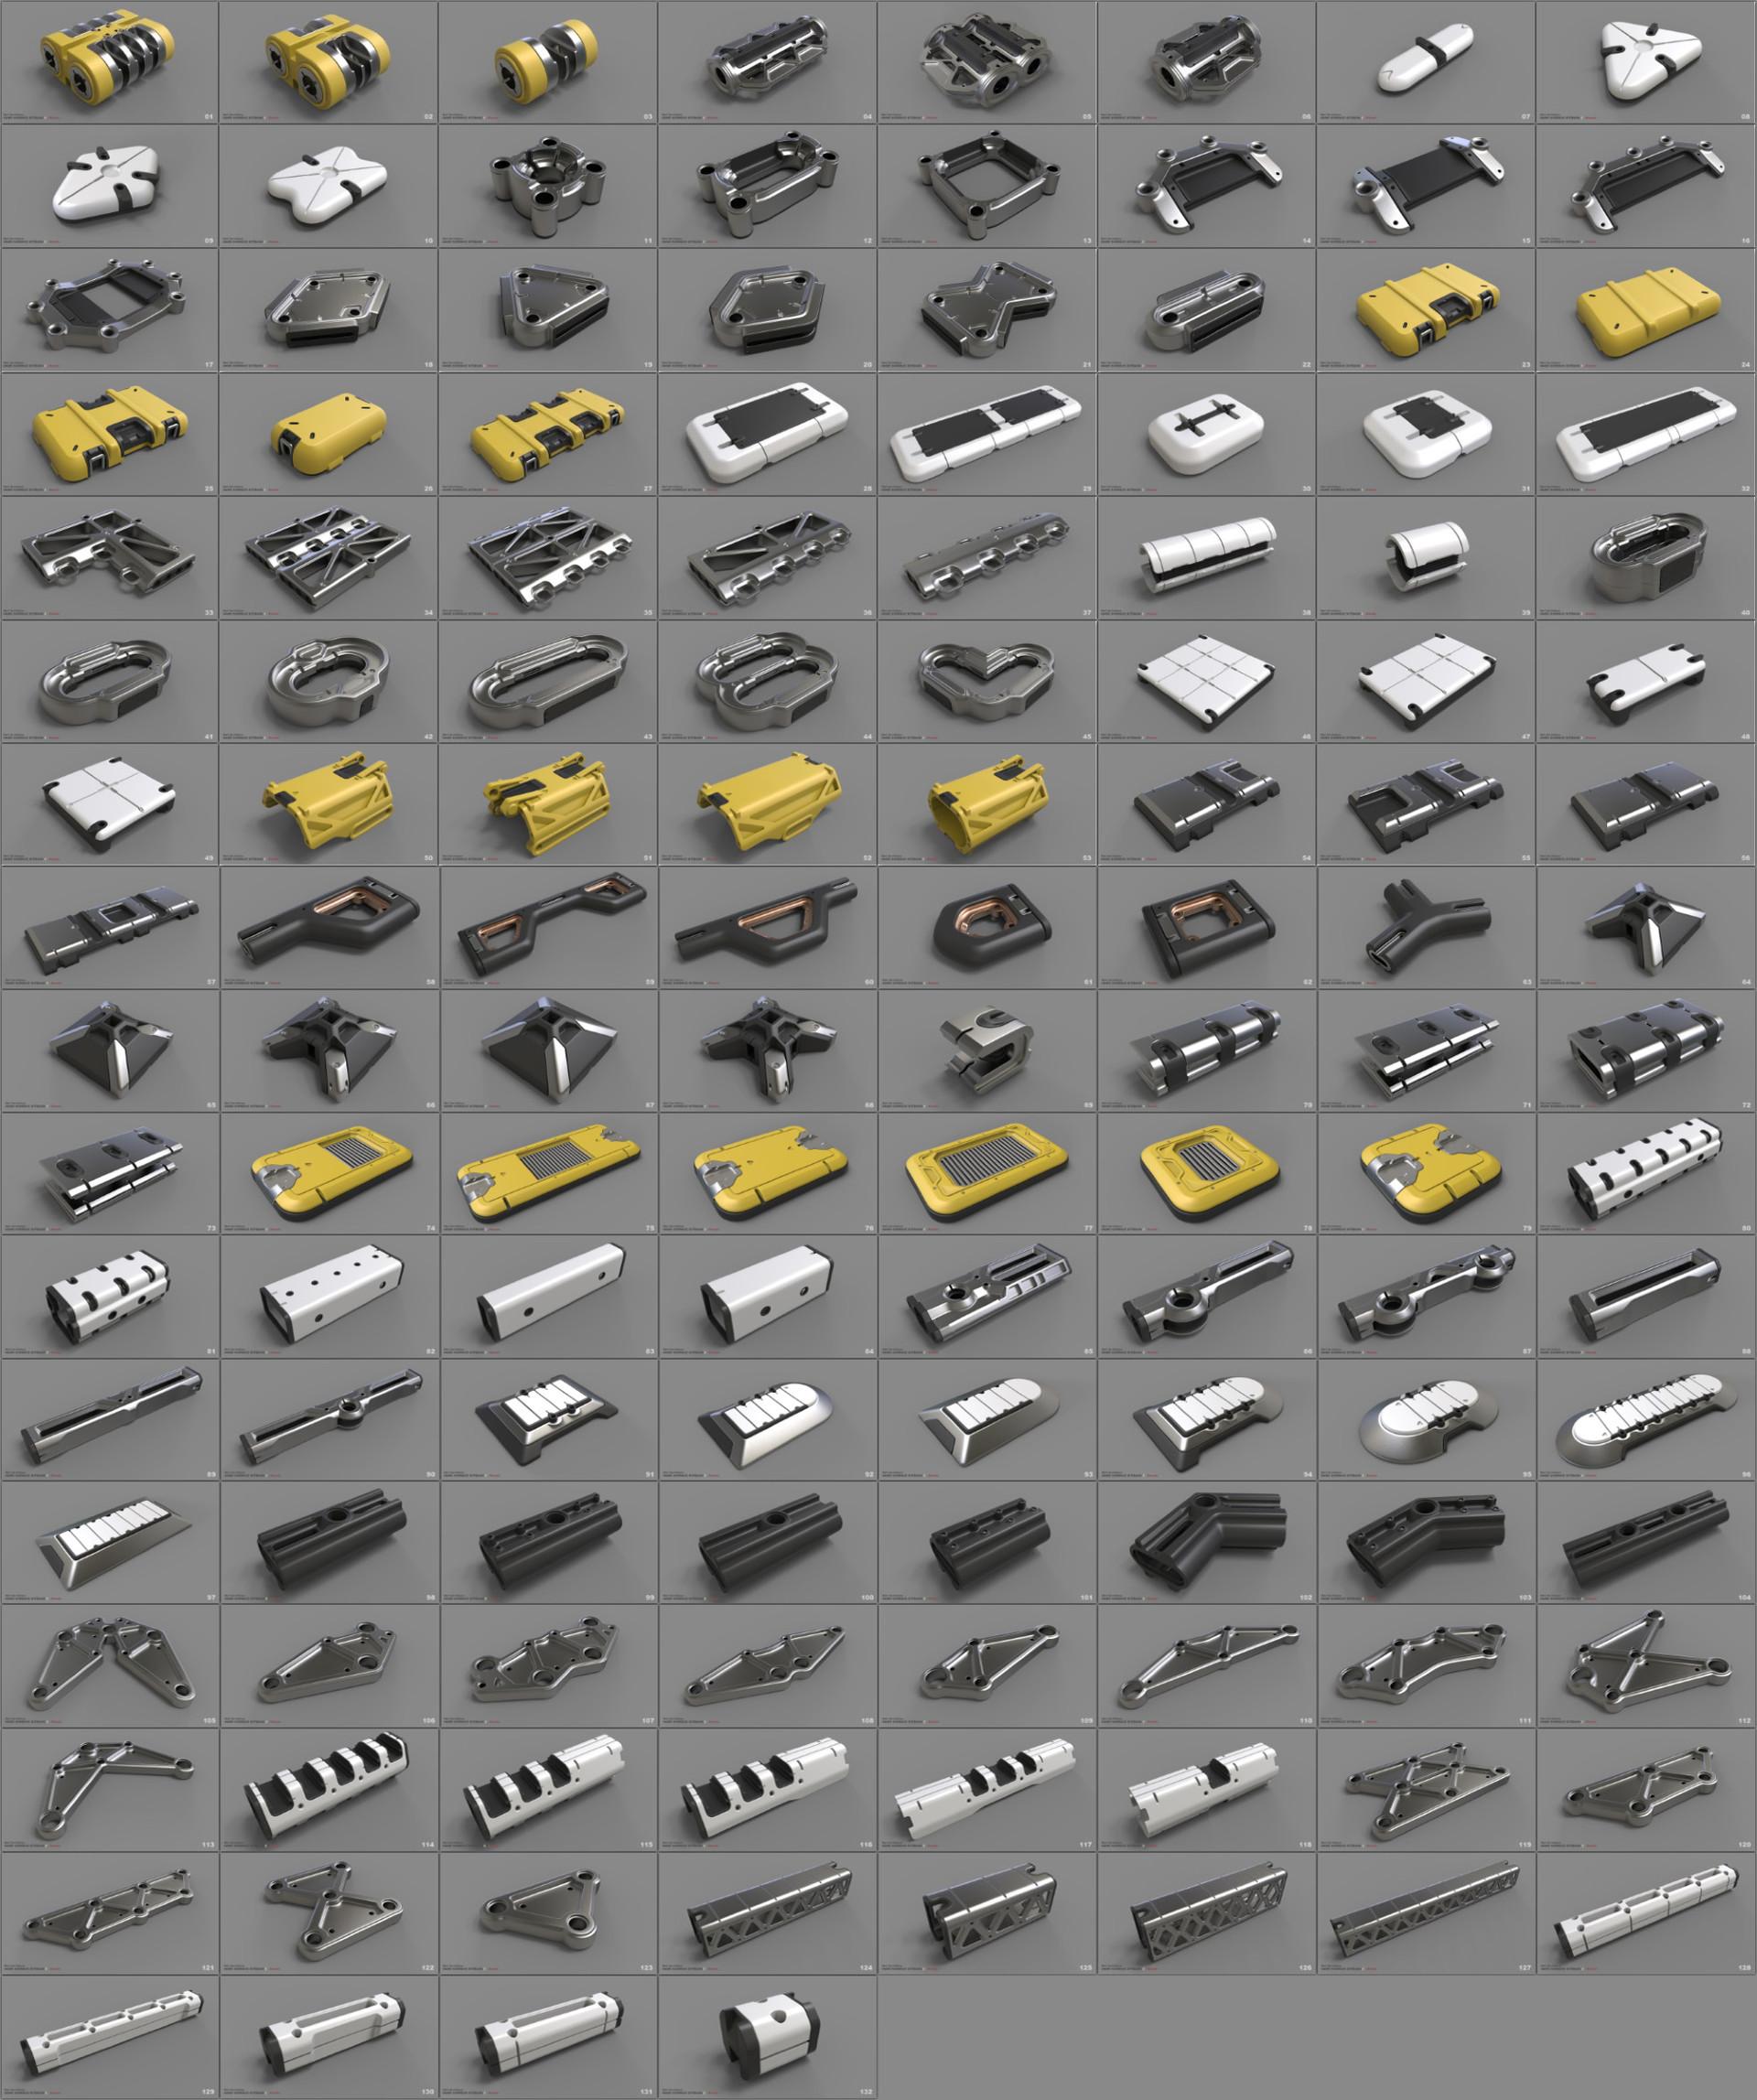 Mark van haitsma panel icon collage